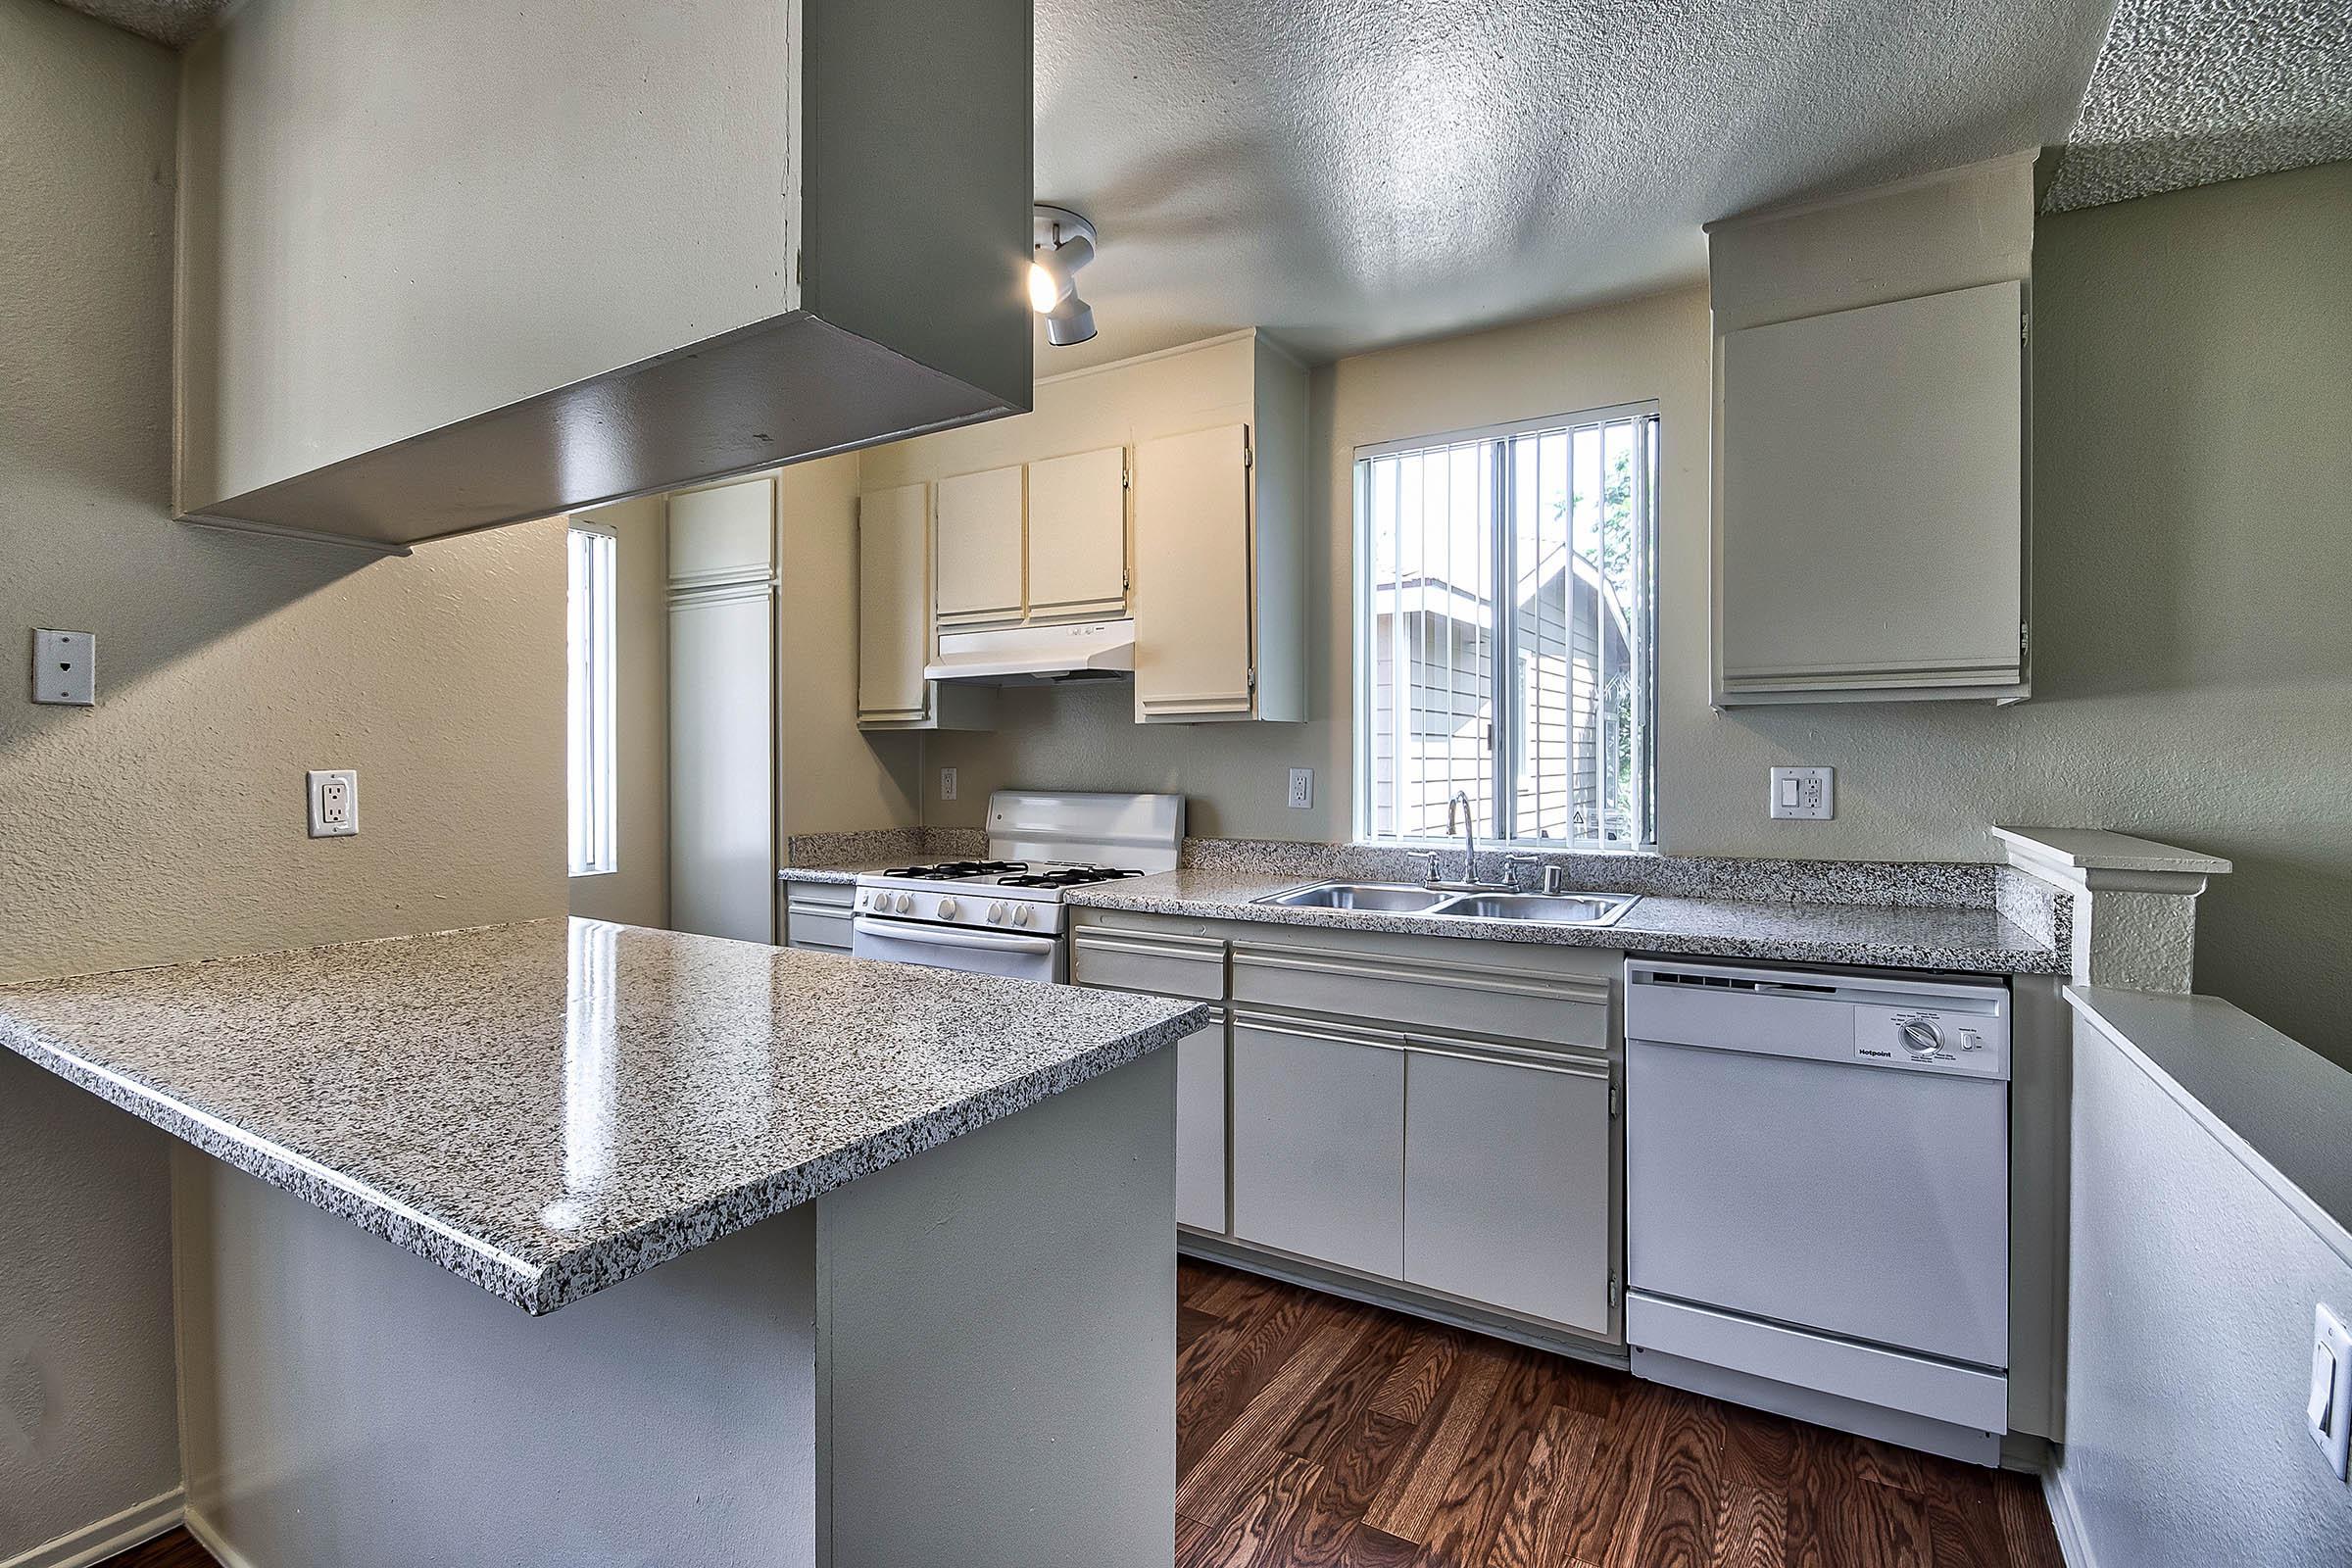 Kitchen_3900_W_5th_St_Santa_Ana_CA_Vintage-Woods_RPI_II-280948-37_v1_current.jpg